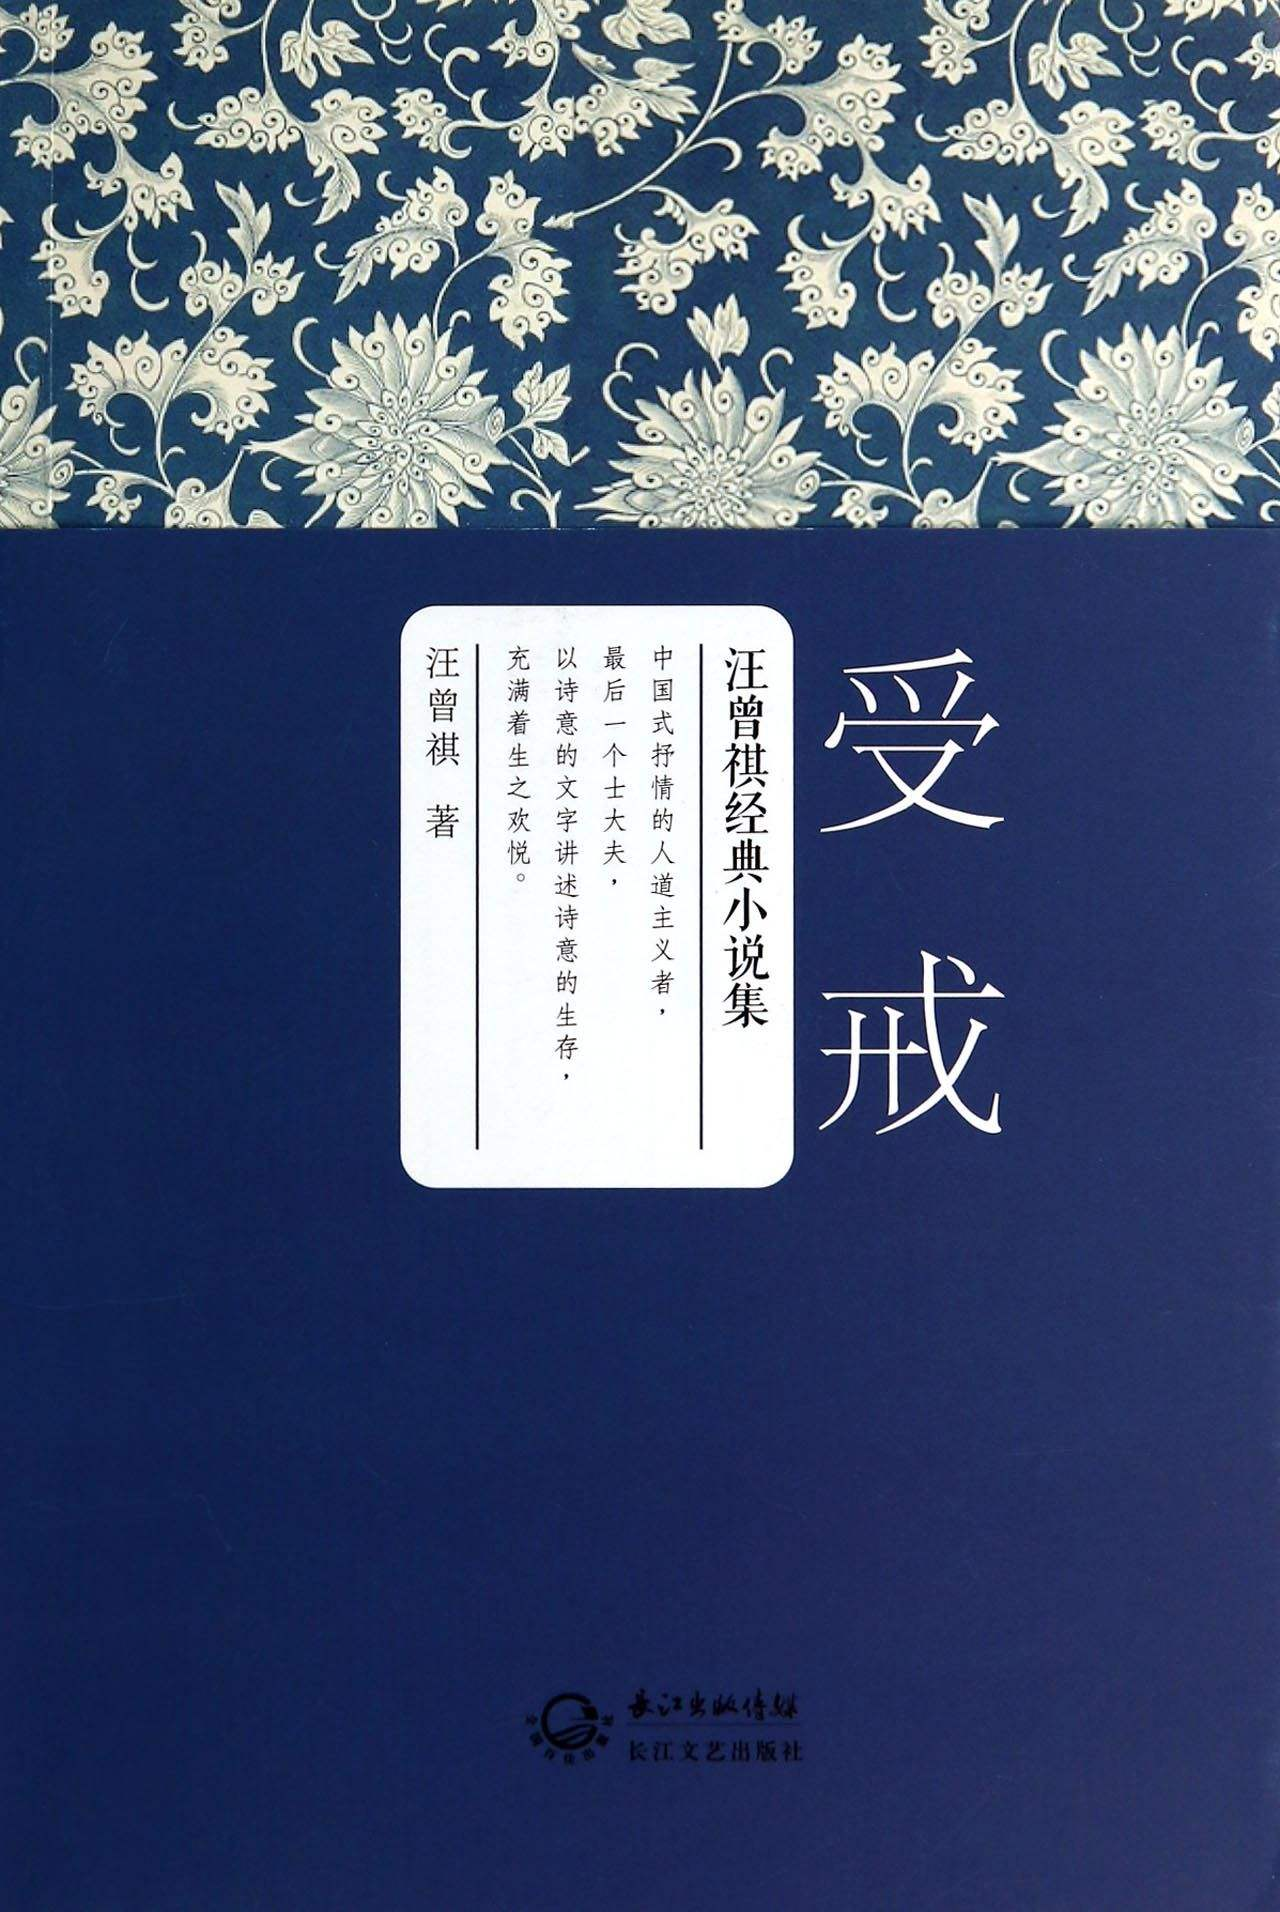 betway必威唯一官方网站 1